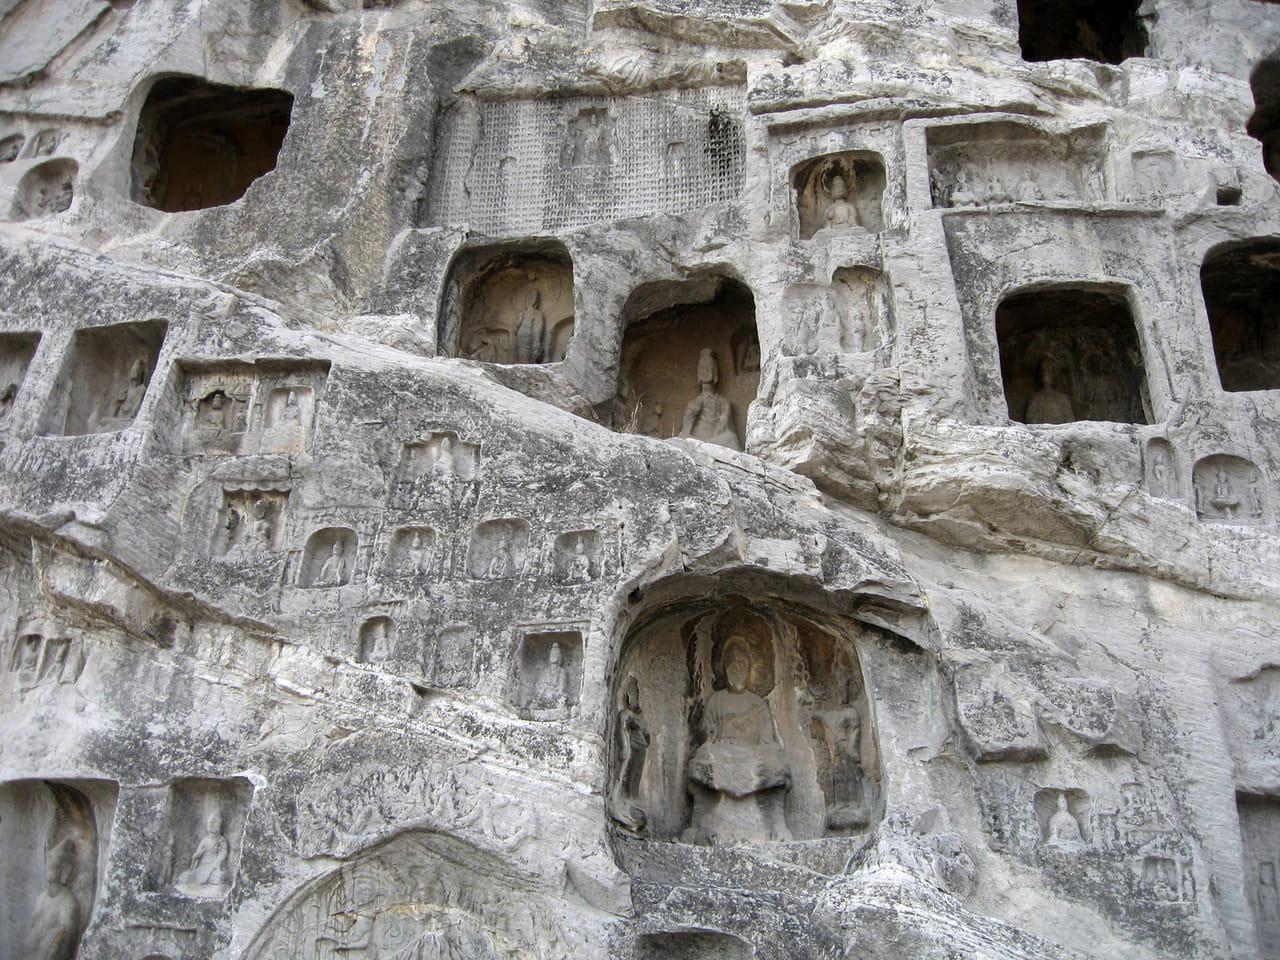 龍門石窟の画像 p1_15